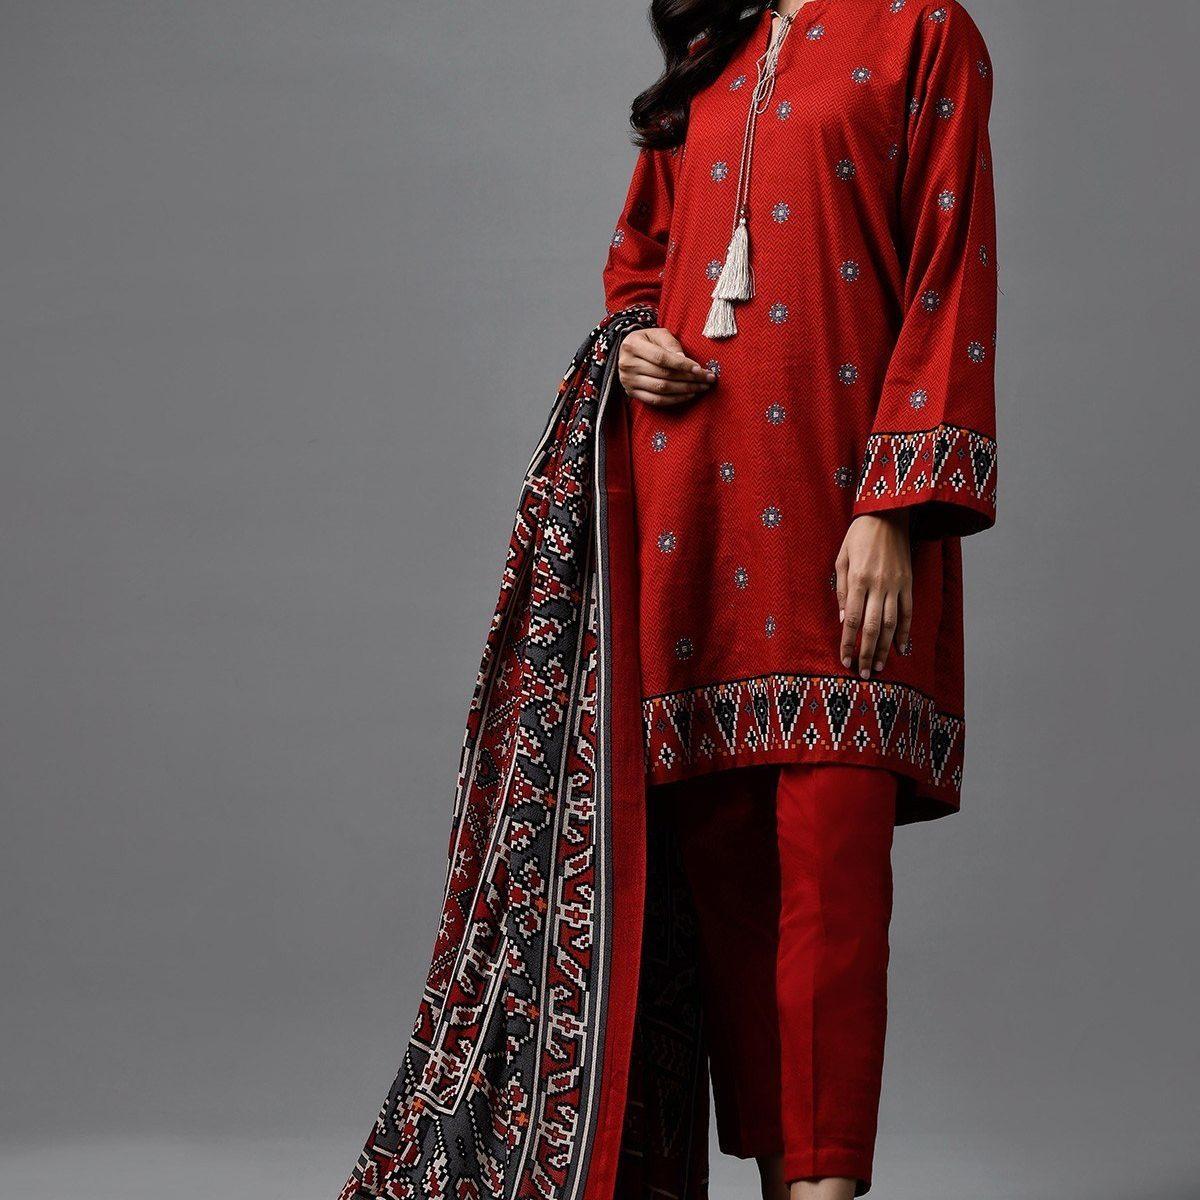 New Winter Kurtis Designs in Pakistan for women 2020